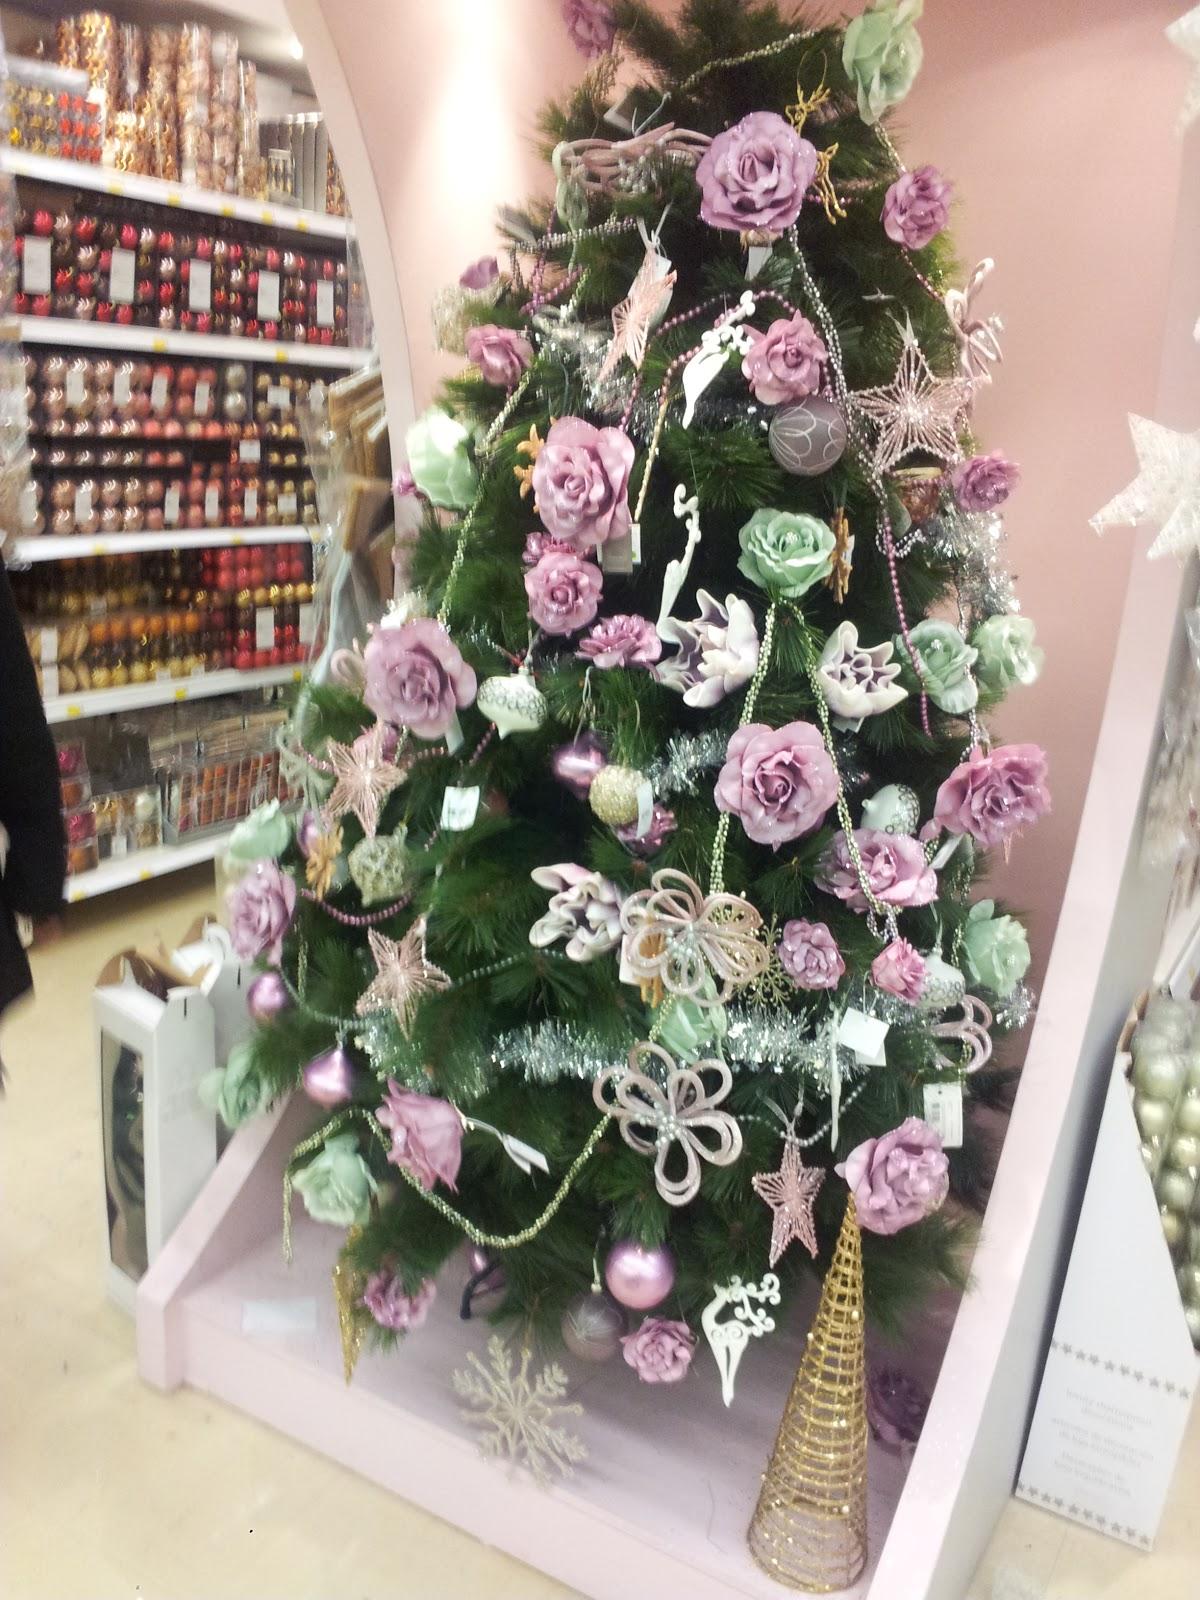 C mo no decorar un rbol de navidad mis peques y m s - Ideas para decorar un arbol de navidad ...